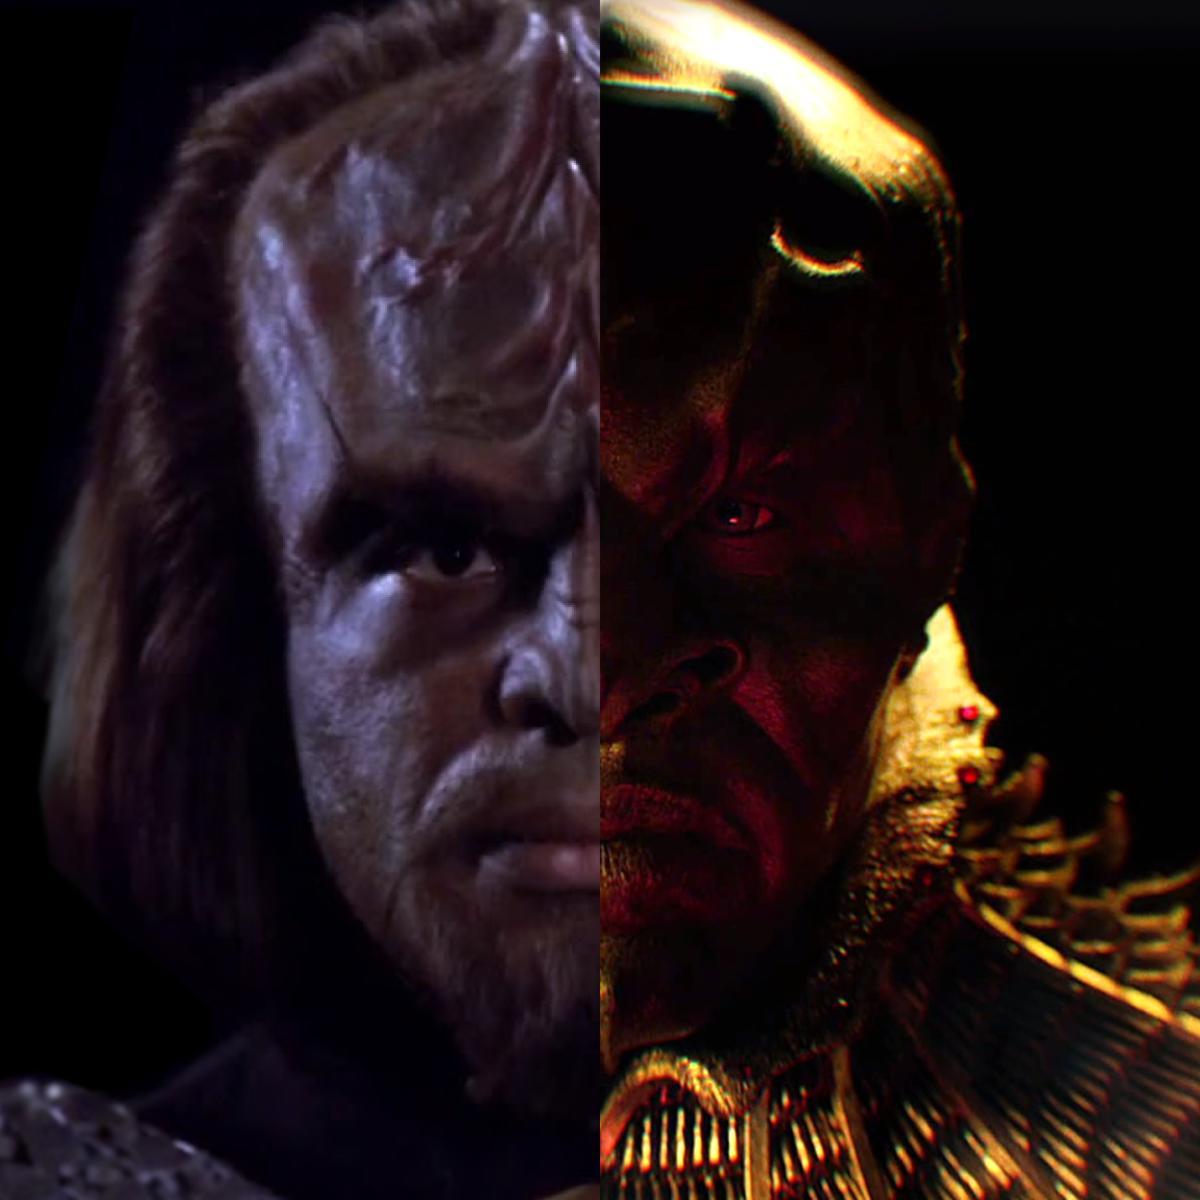 syfy-worf-vs-dsc-klingons-hero.png